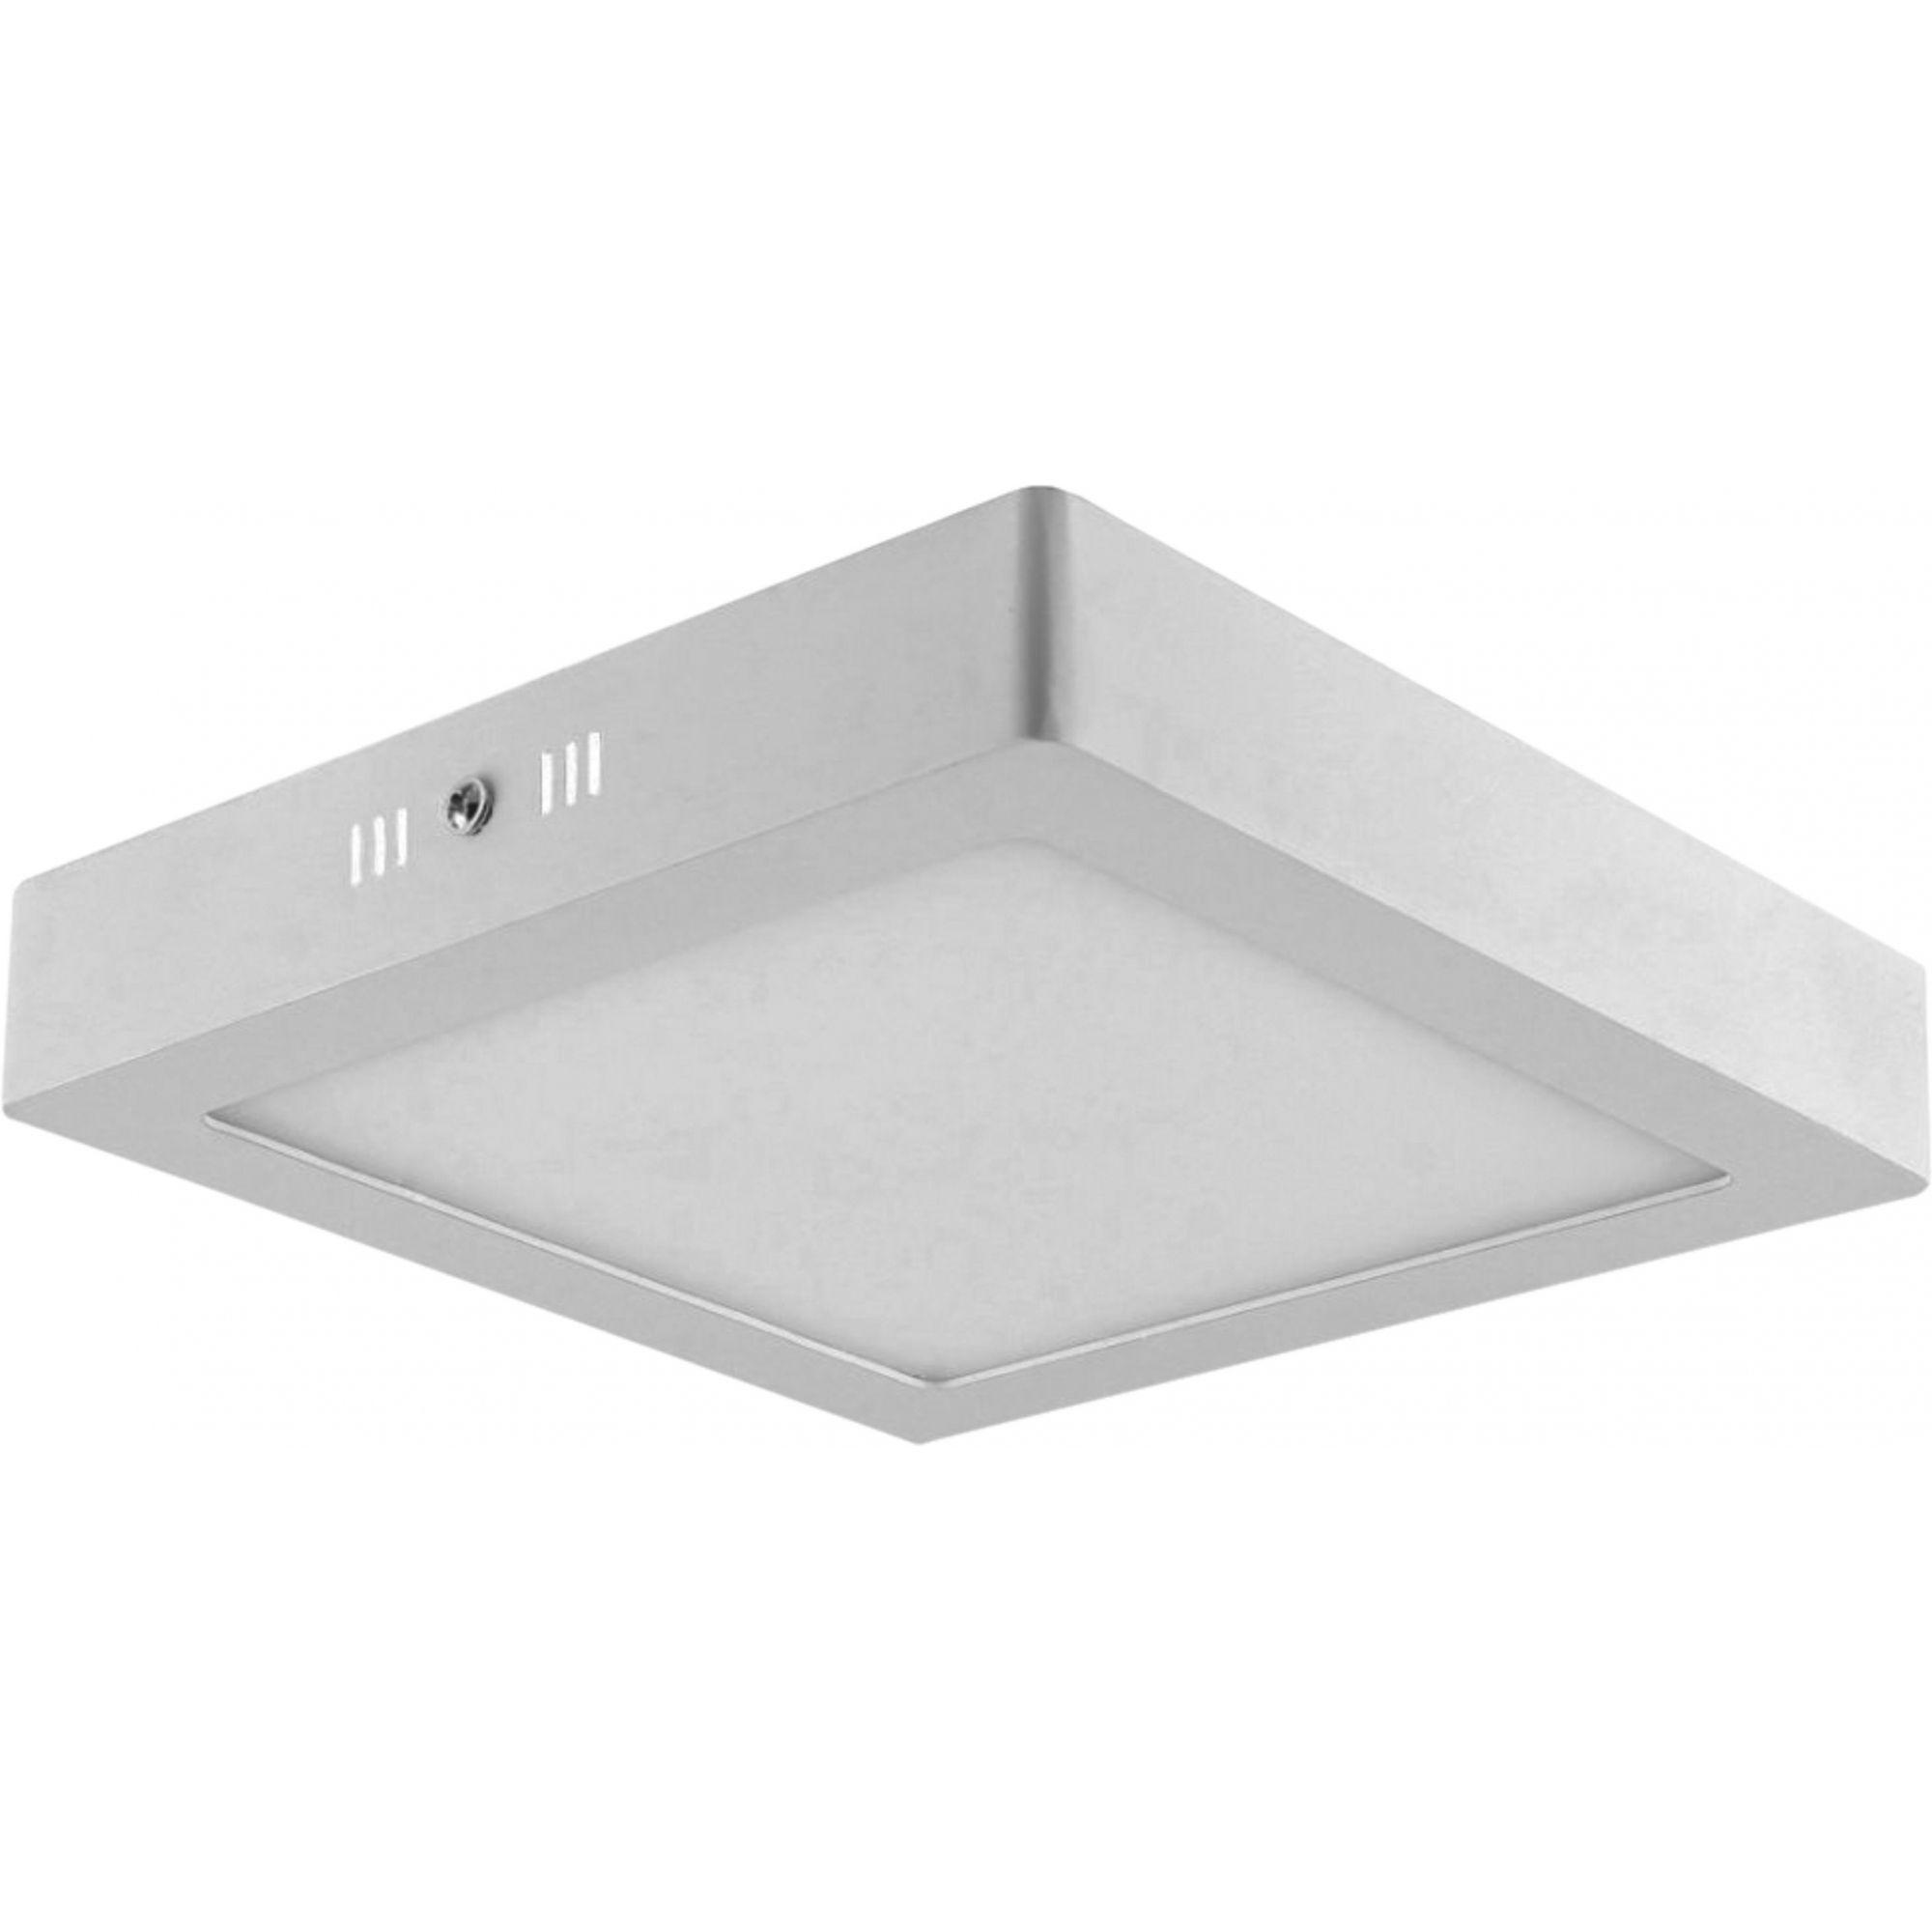 Painel LED Sobrepor 24W 30X30CM Quadrado Bivolt - Branco Neutro 4000K